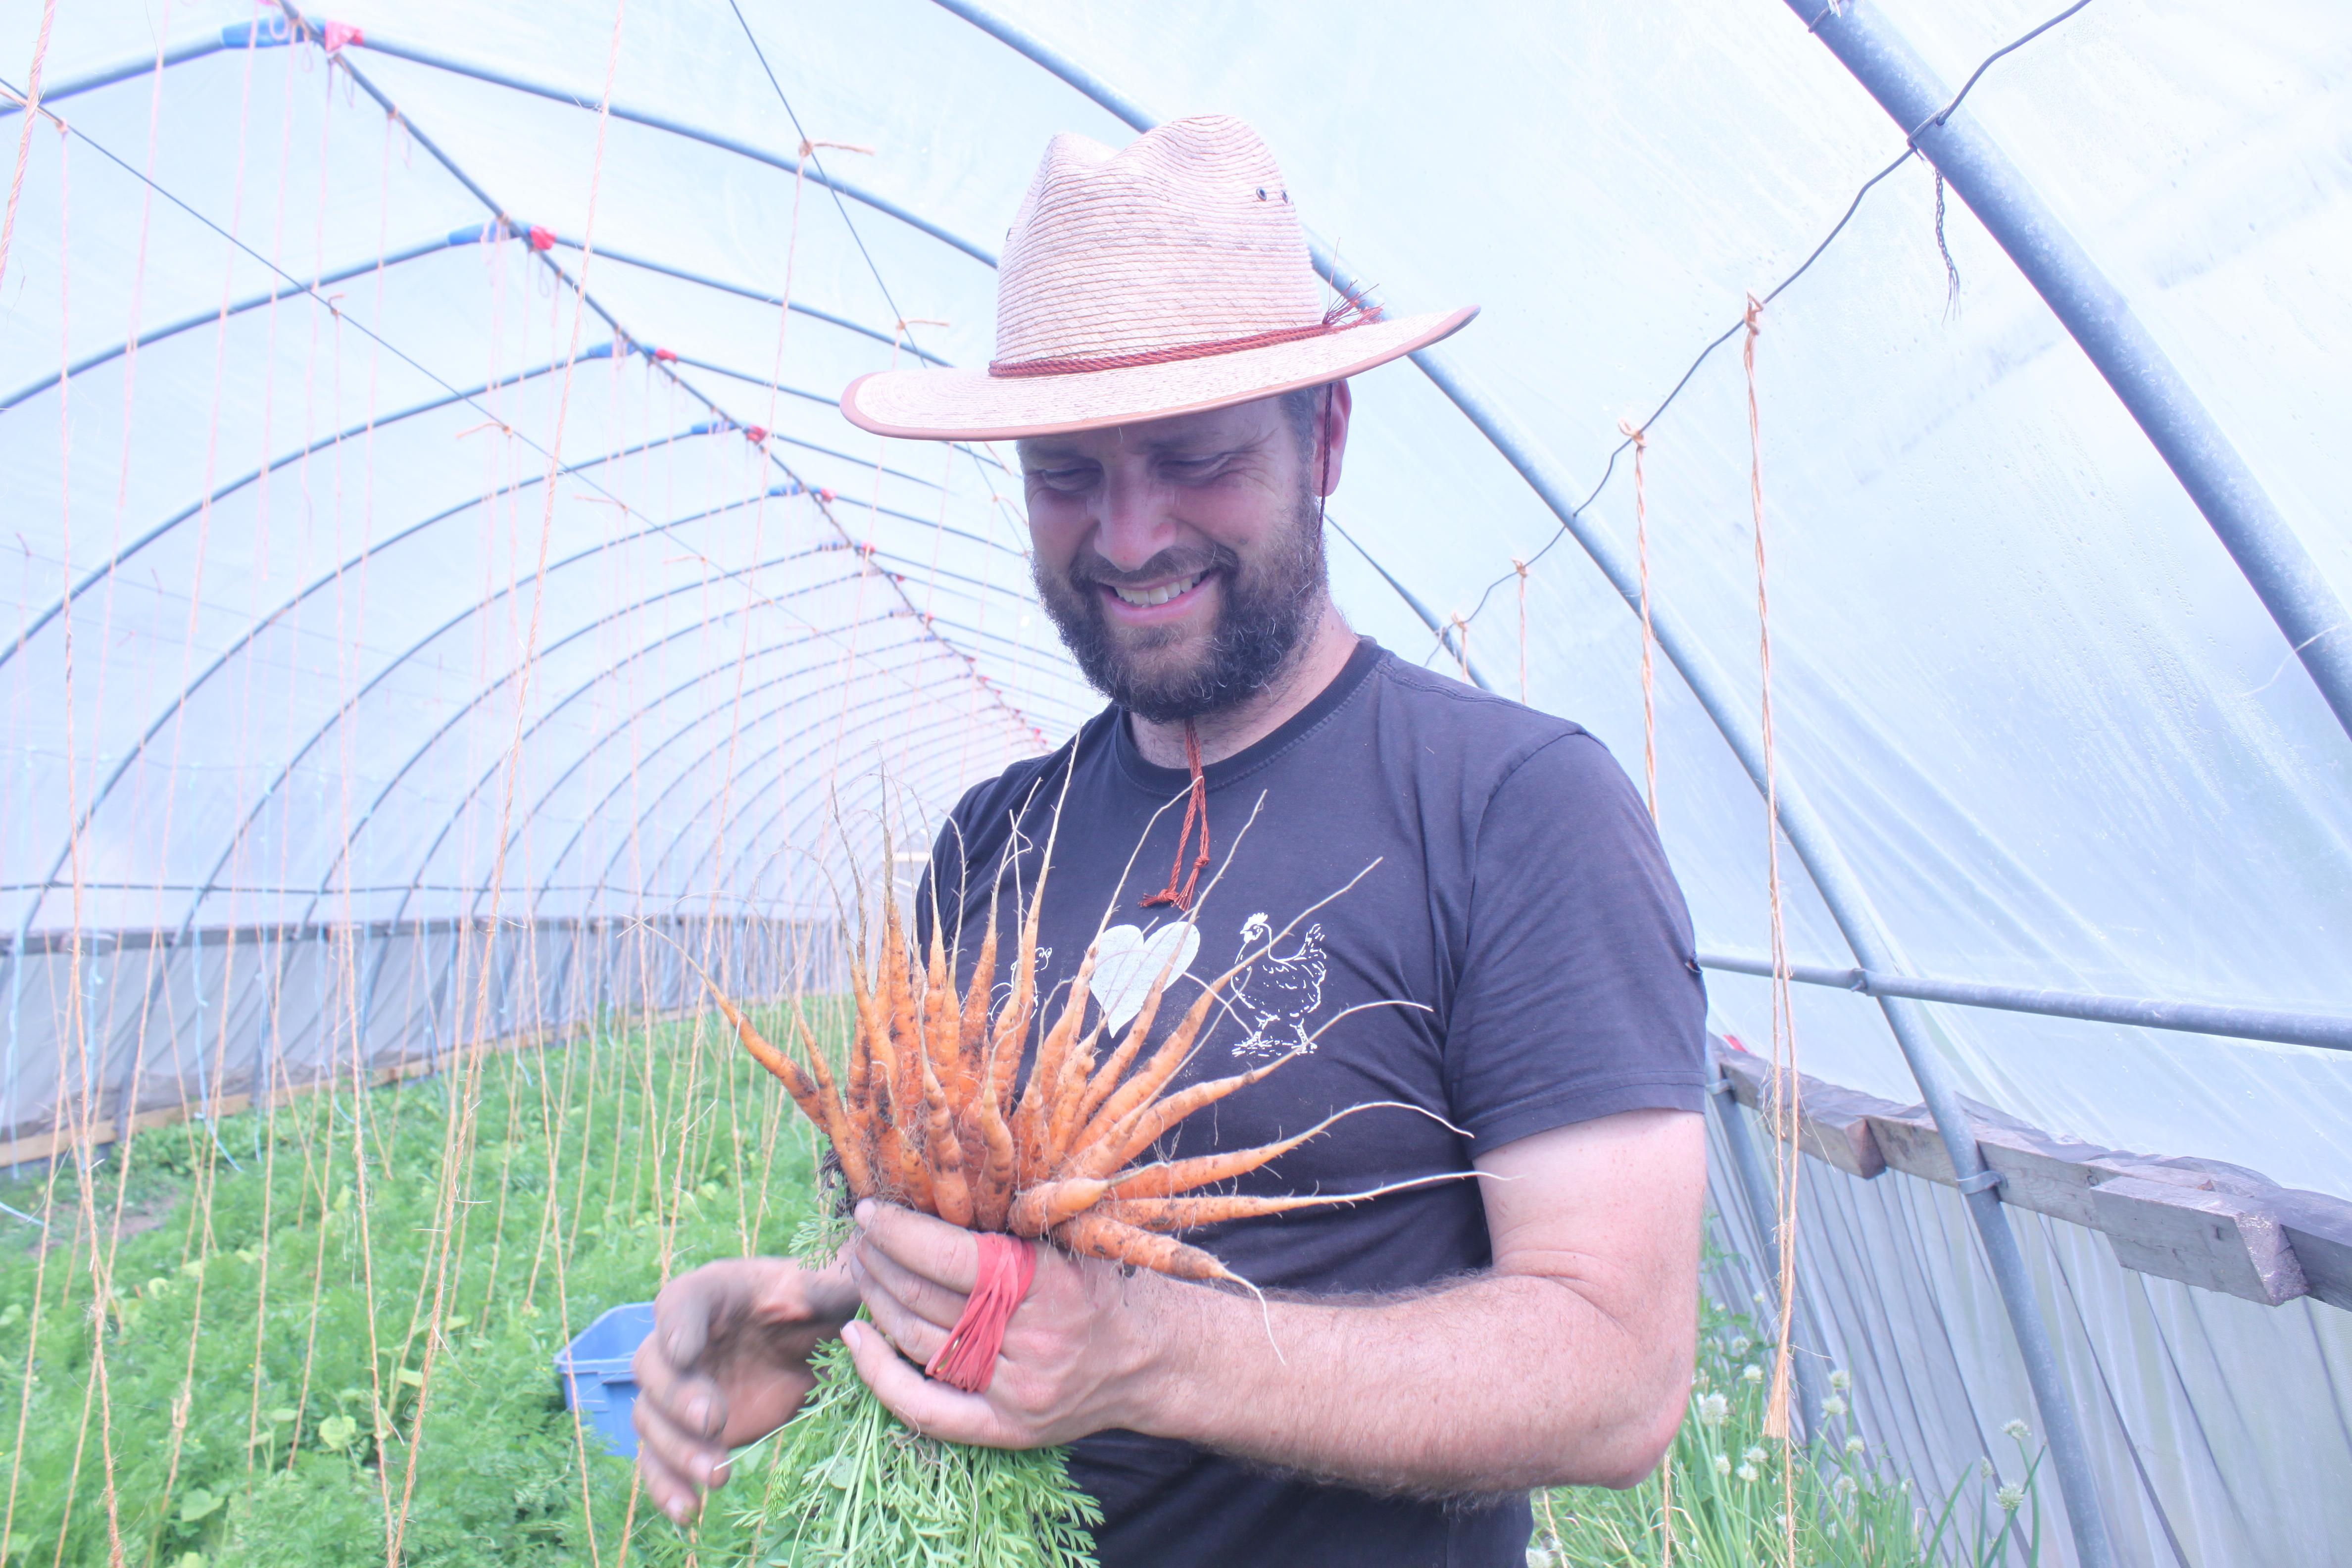 Common Ground Farm Owner Chris Devries